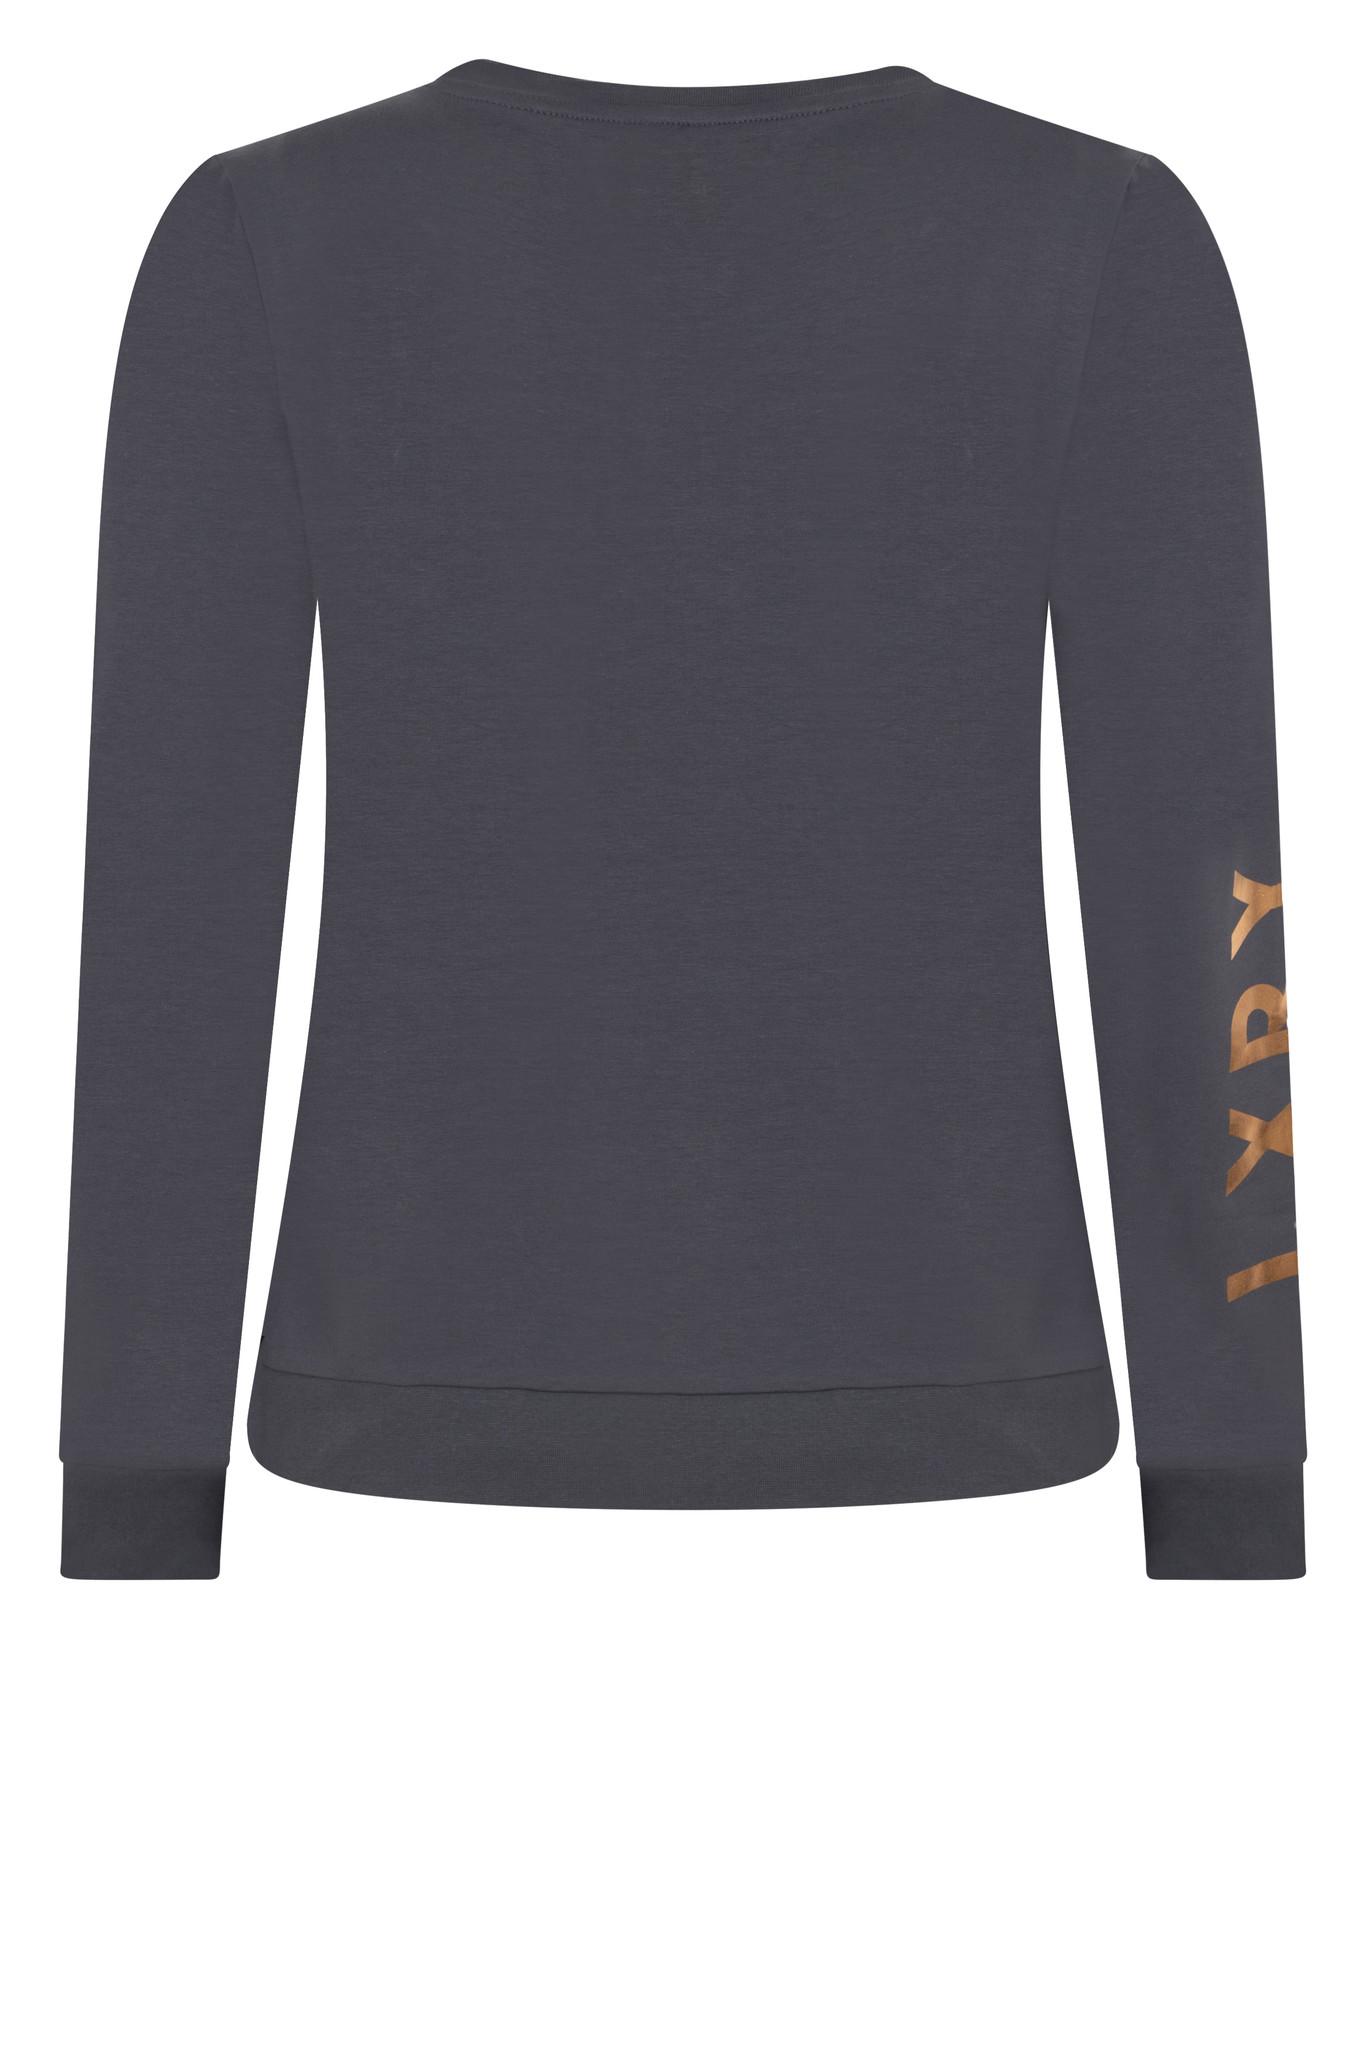 Zoso Zoso Amanda Luxury sweater with print